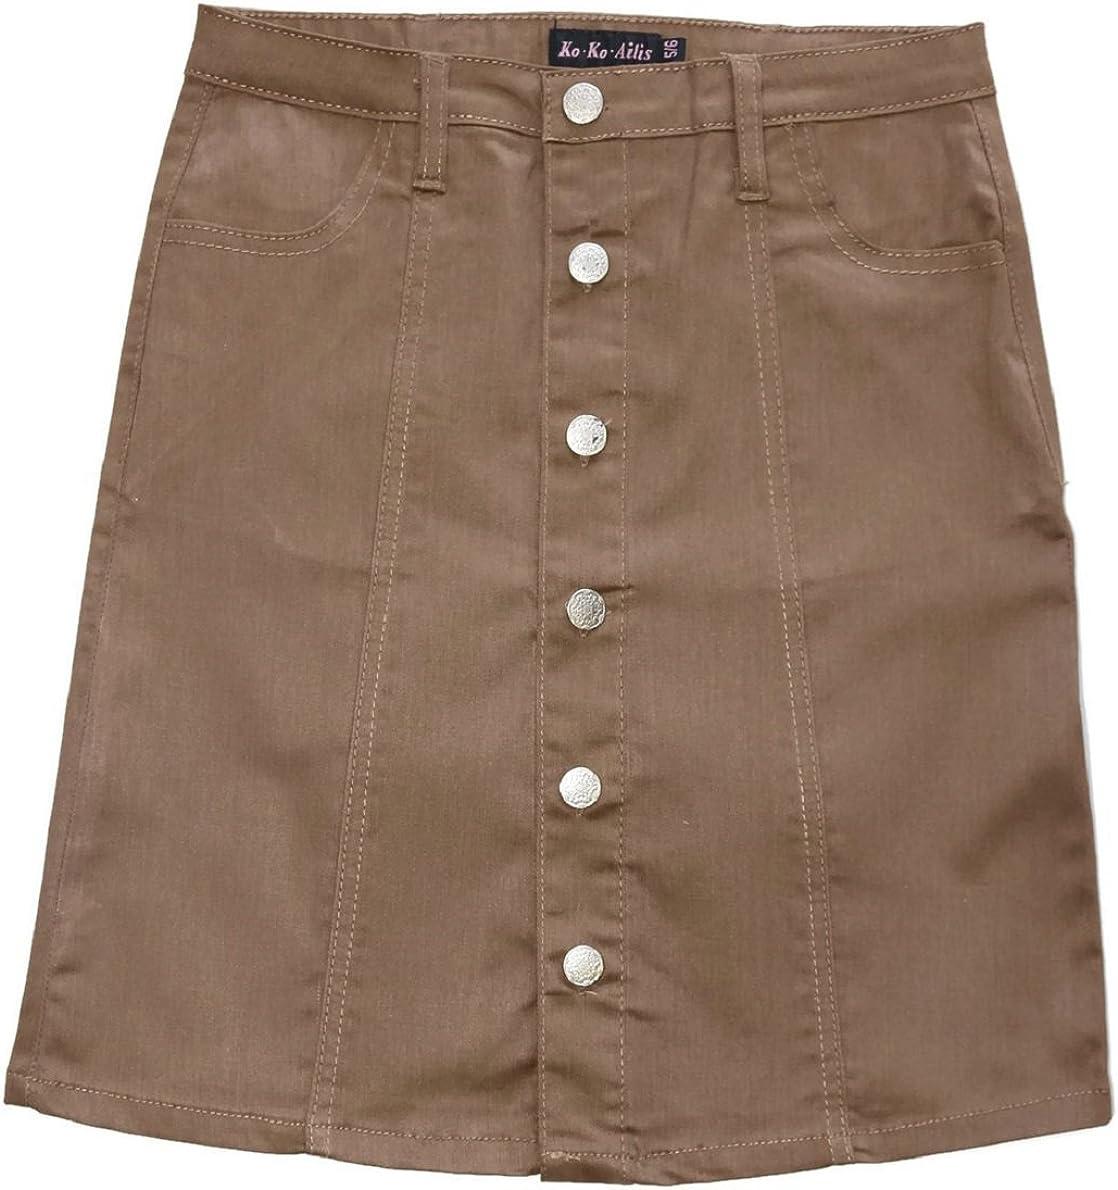 FGR Ko Ko Ailis Womens Stretch Twill Button Flare Skirt with Side Pocket